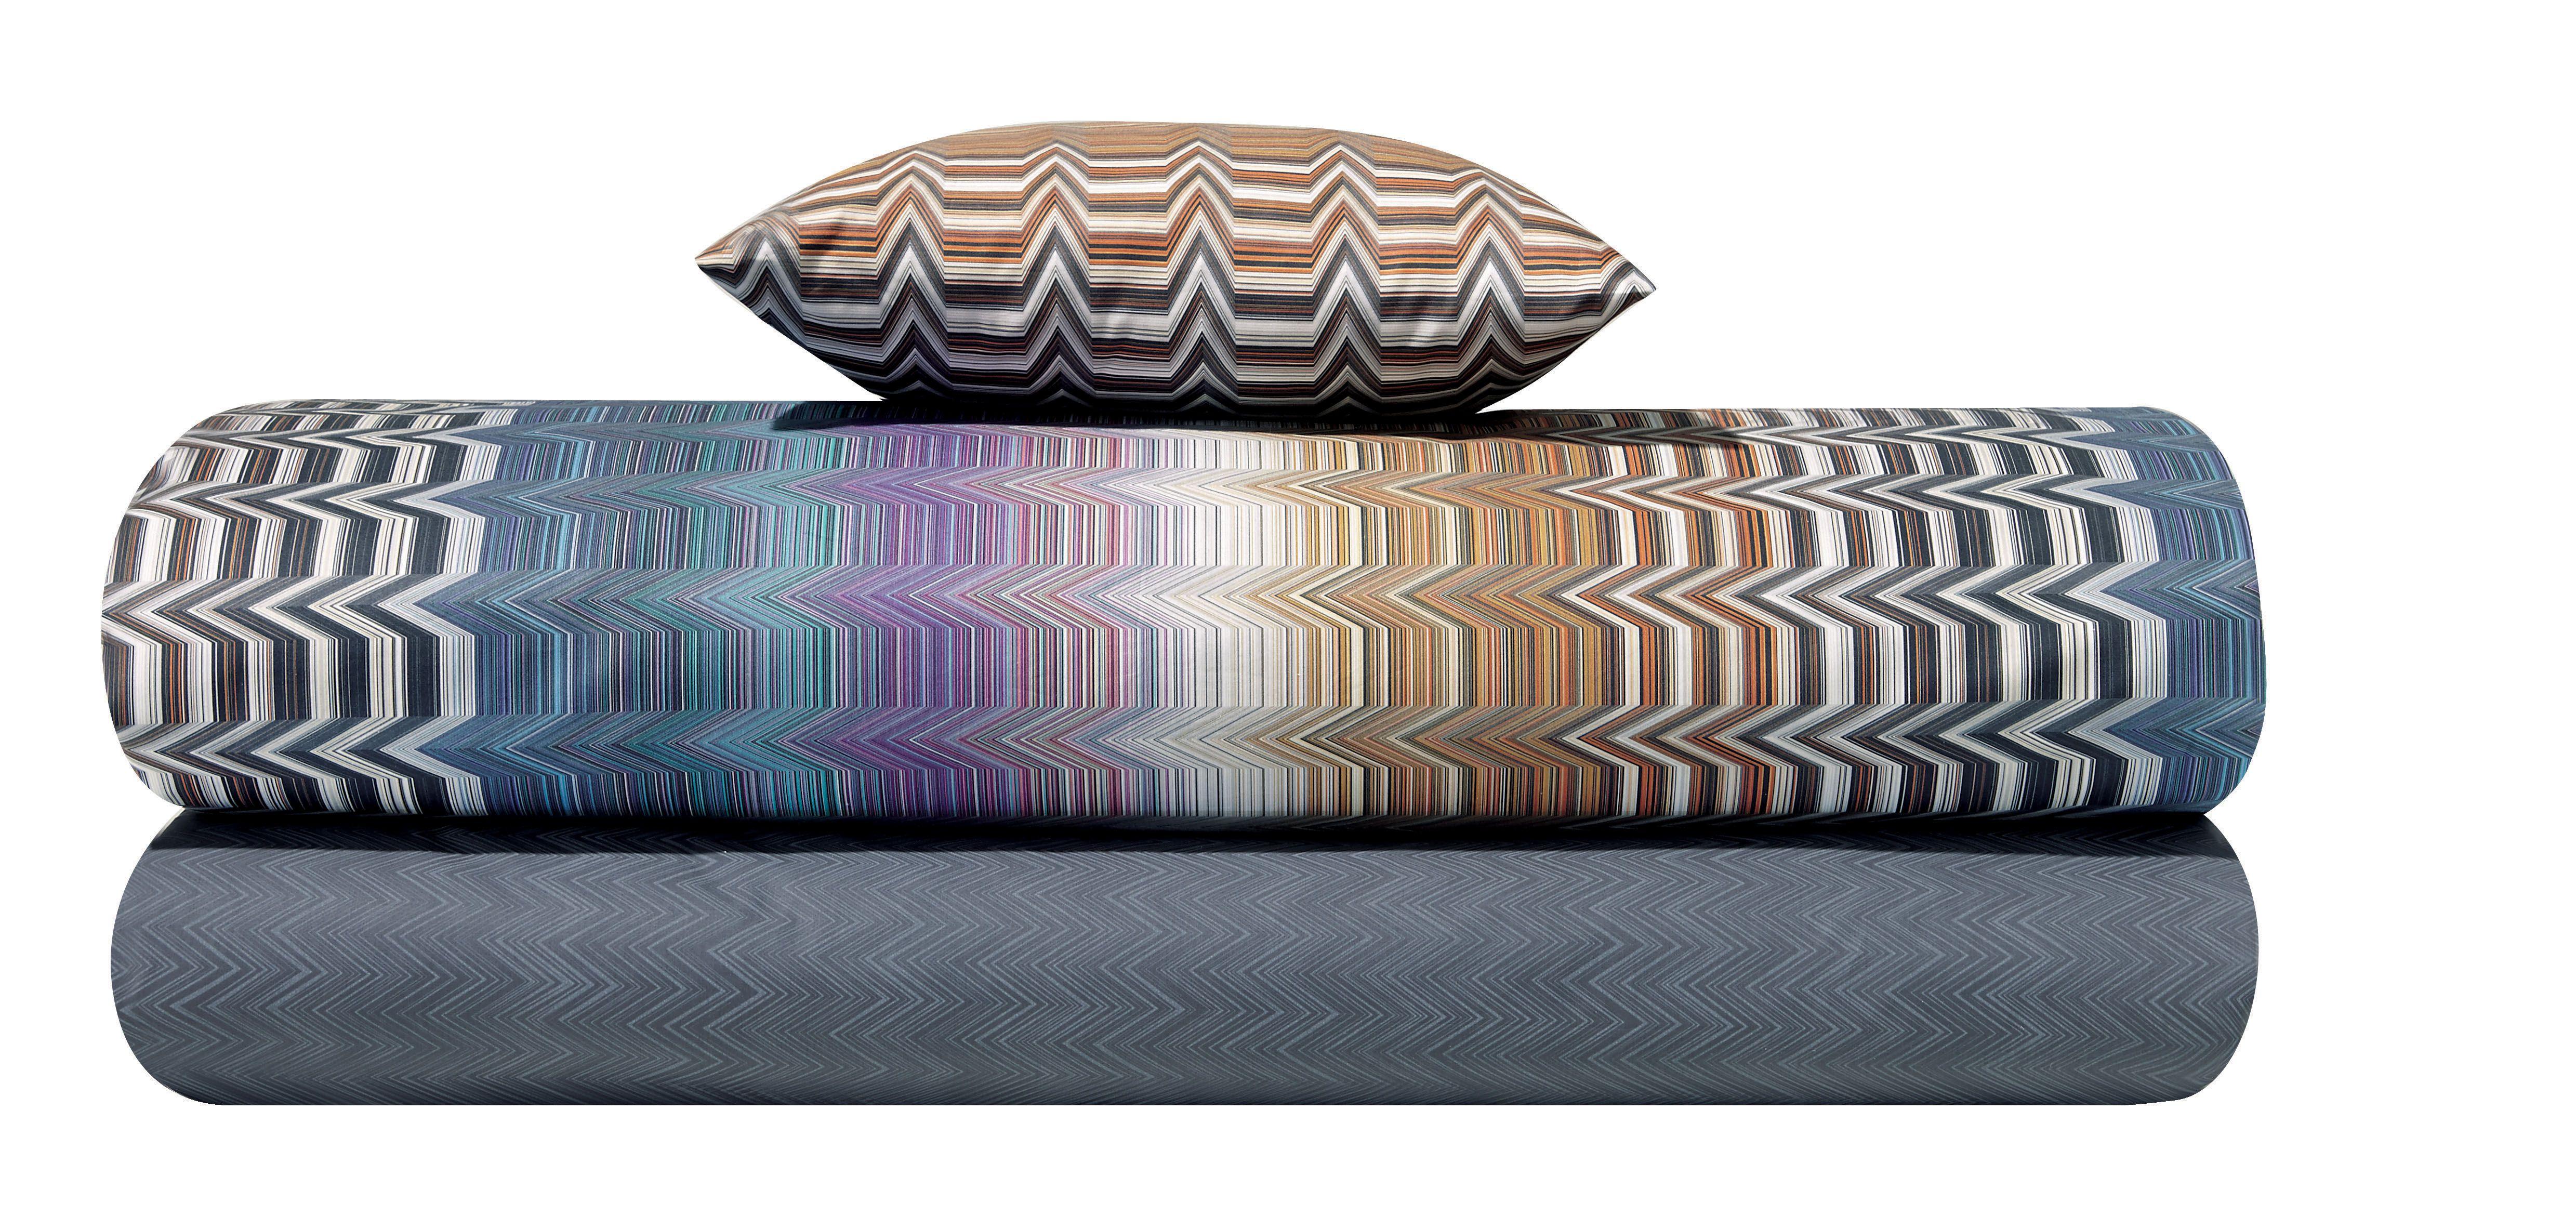 SEYMOUR bed linen @missonihome